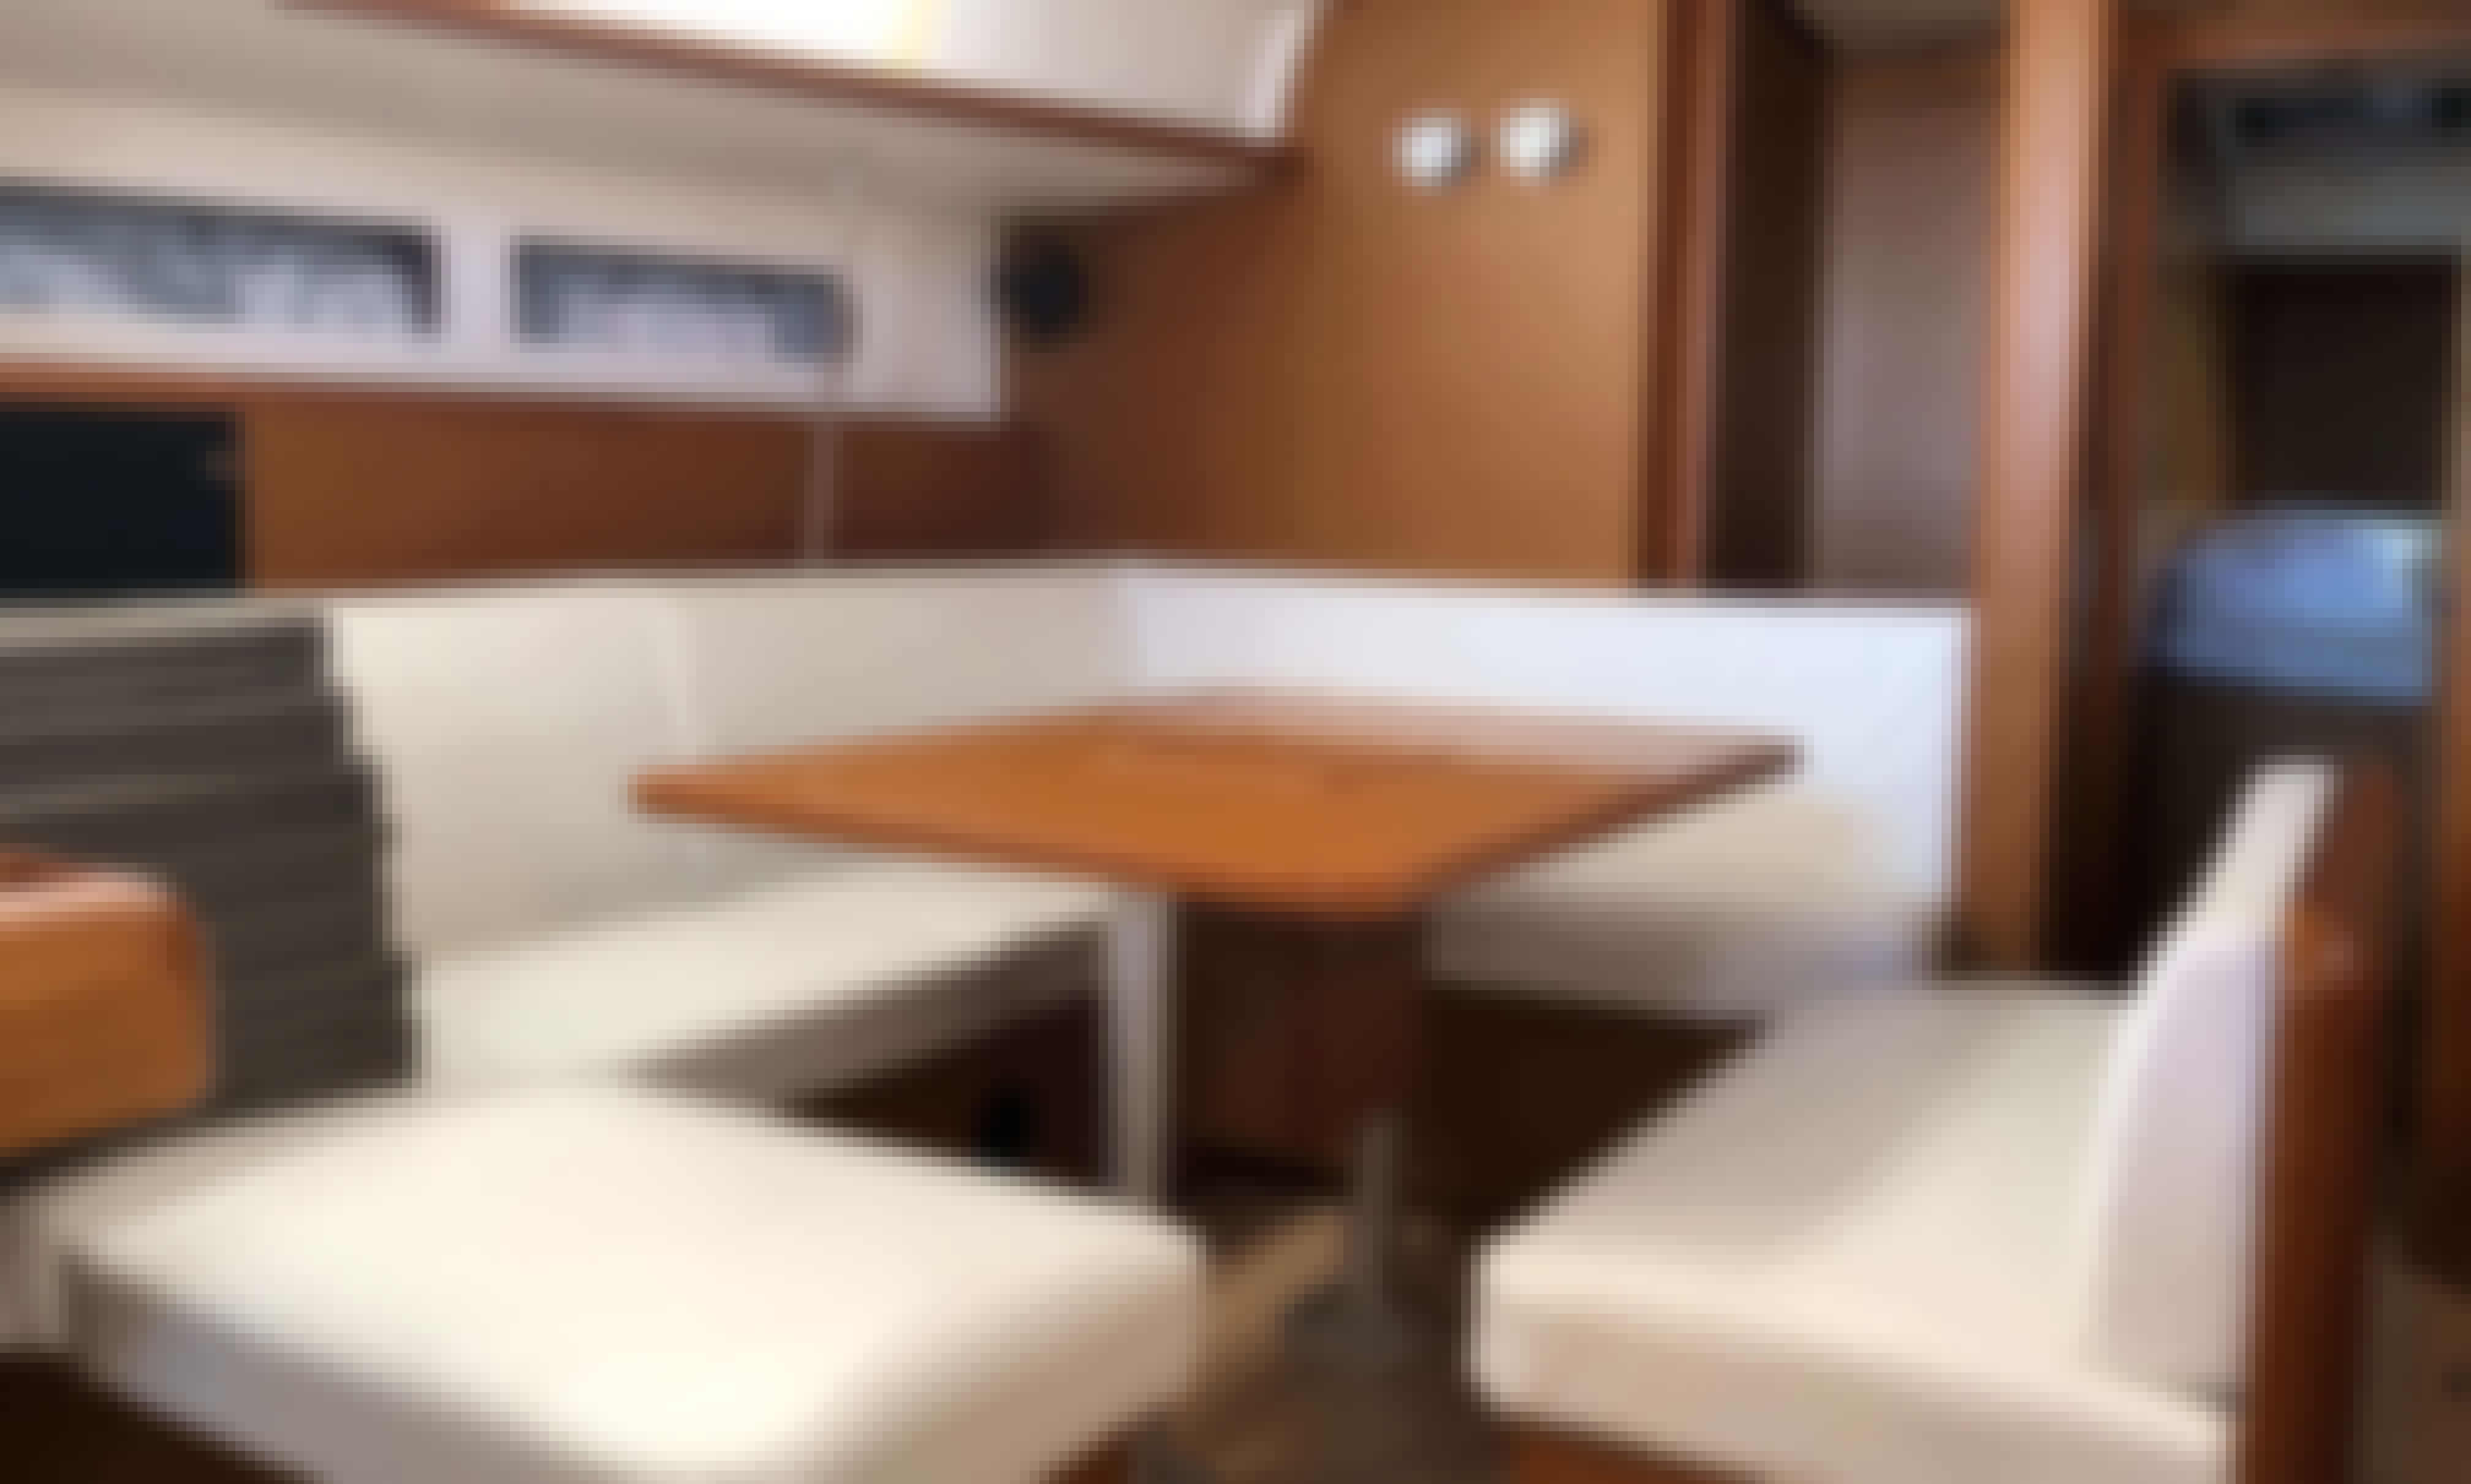 Jeanneau Sun Odyssey 469 Sailboat based in Lefkada, Greece